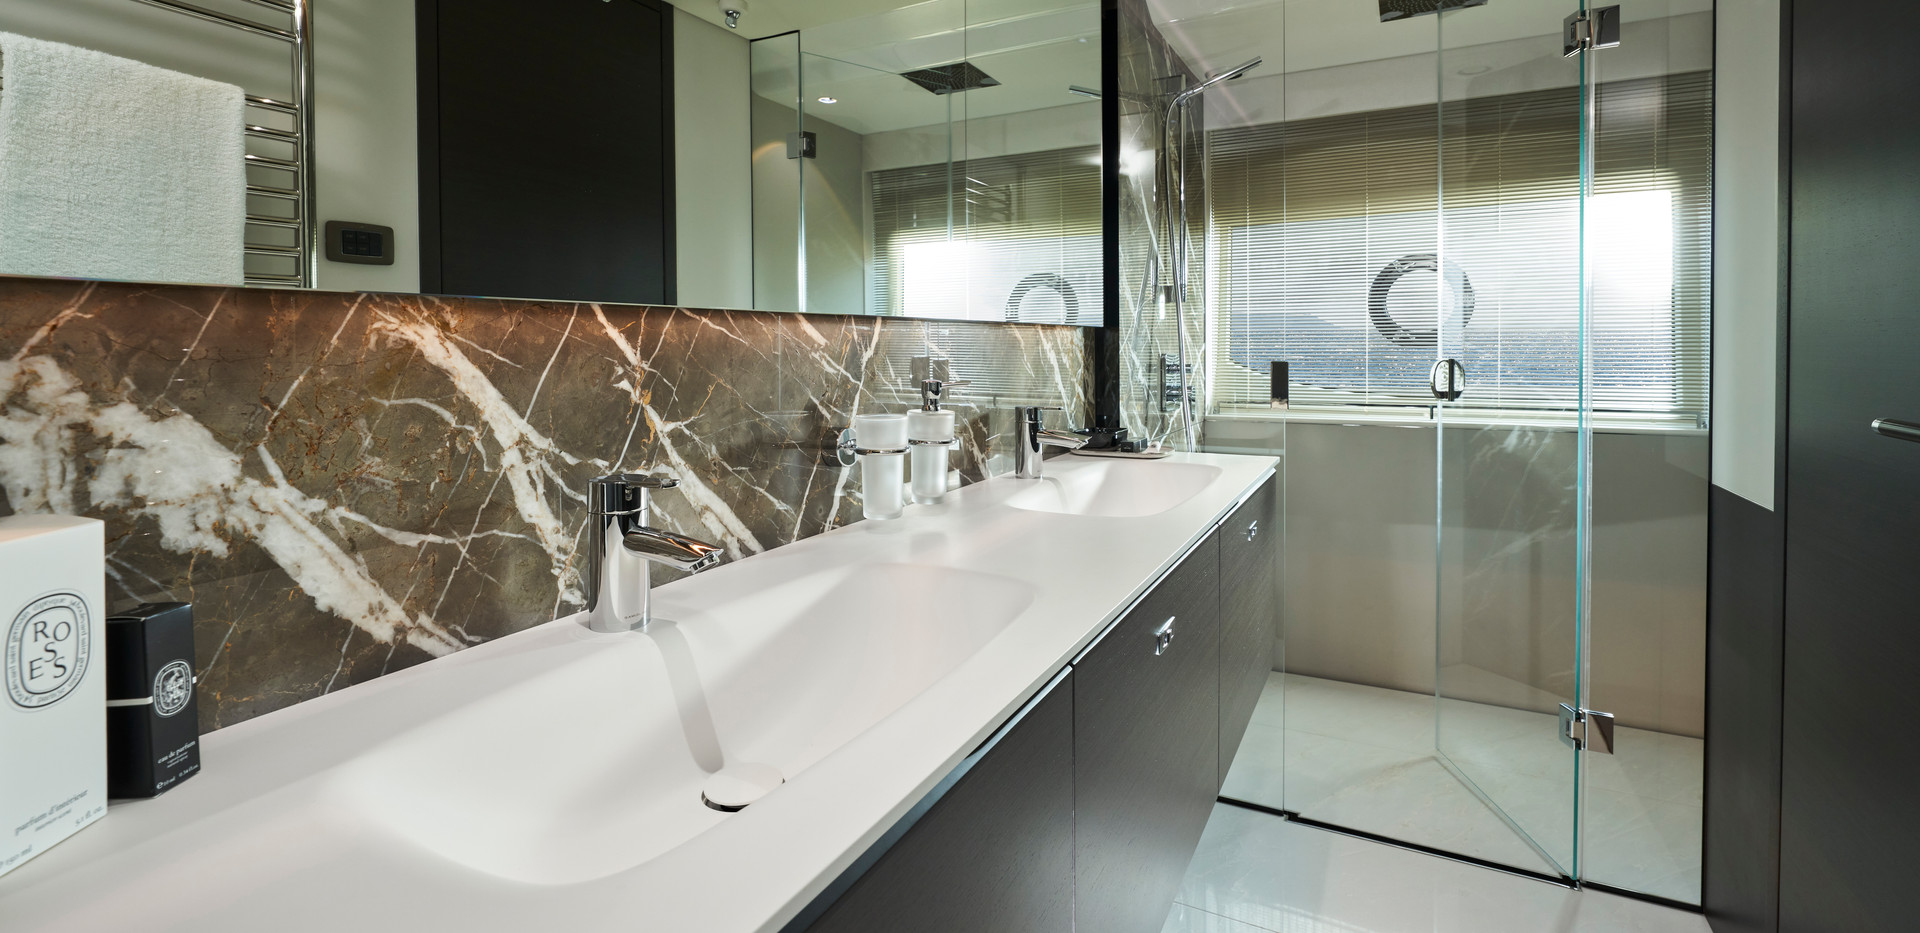 x95-slot-2-interior-guest-stateroom-bath